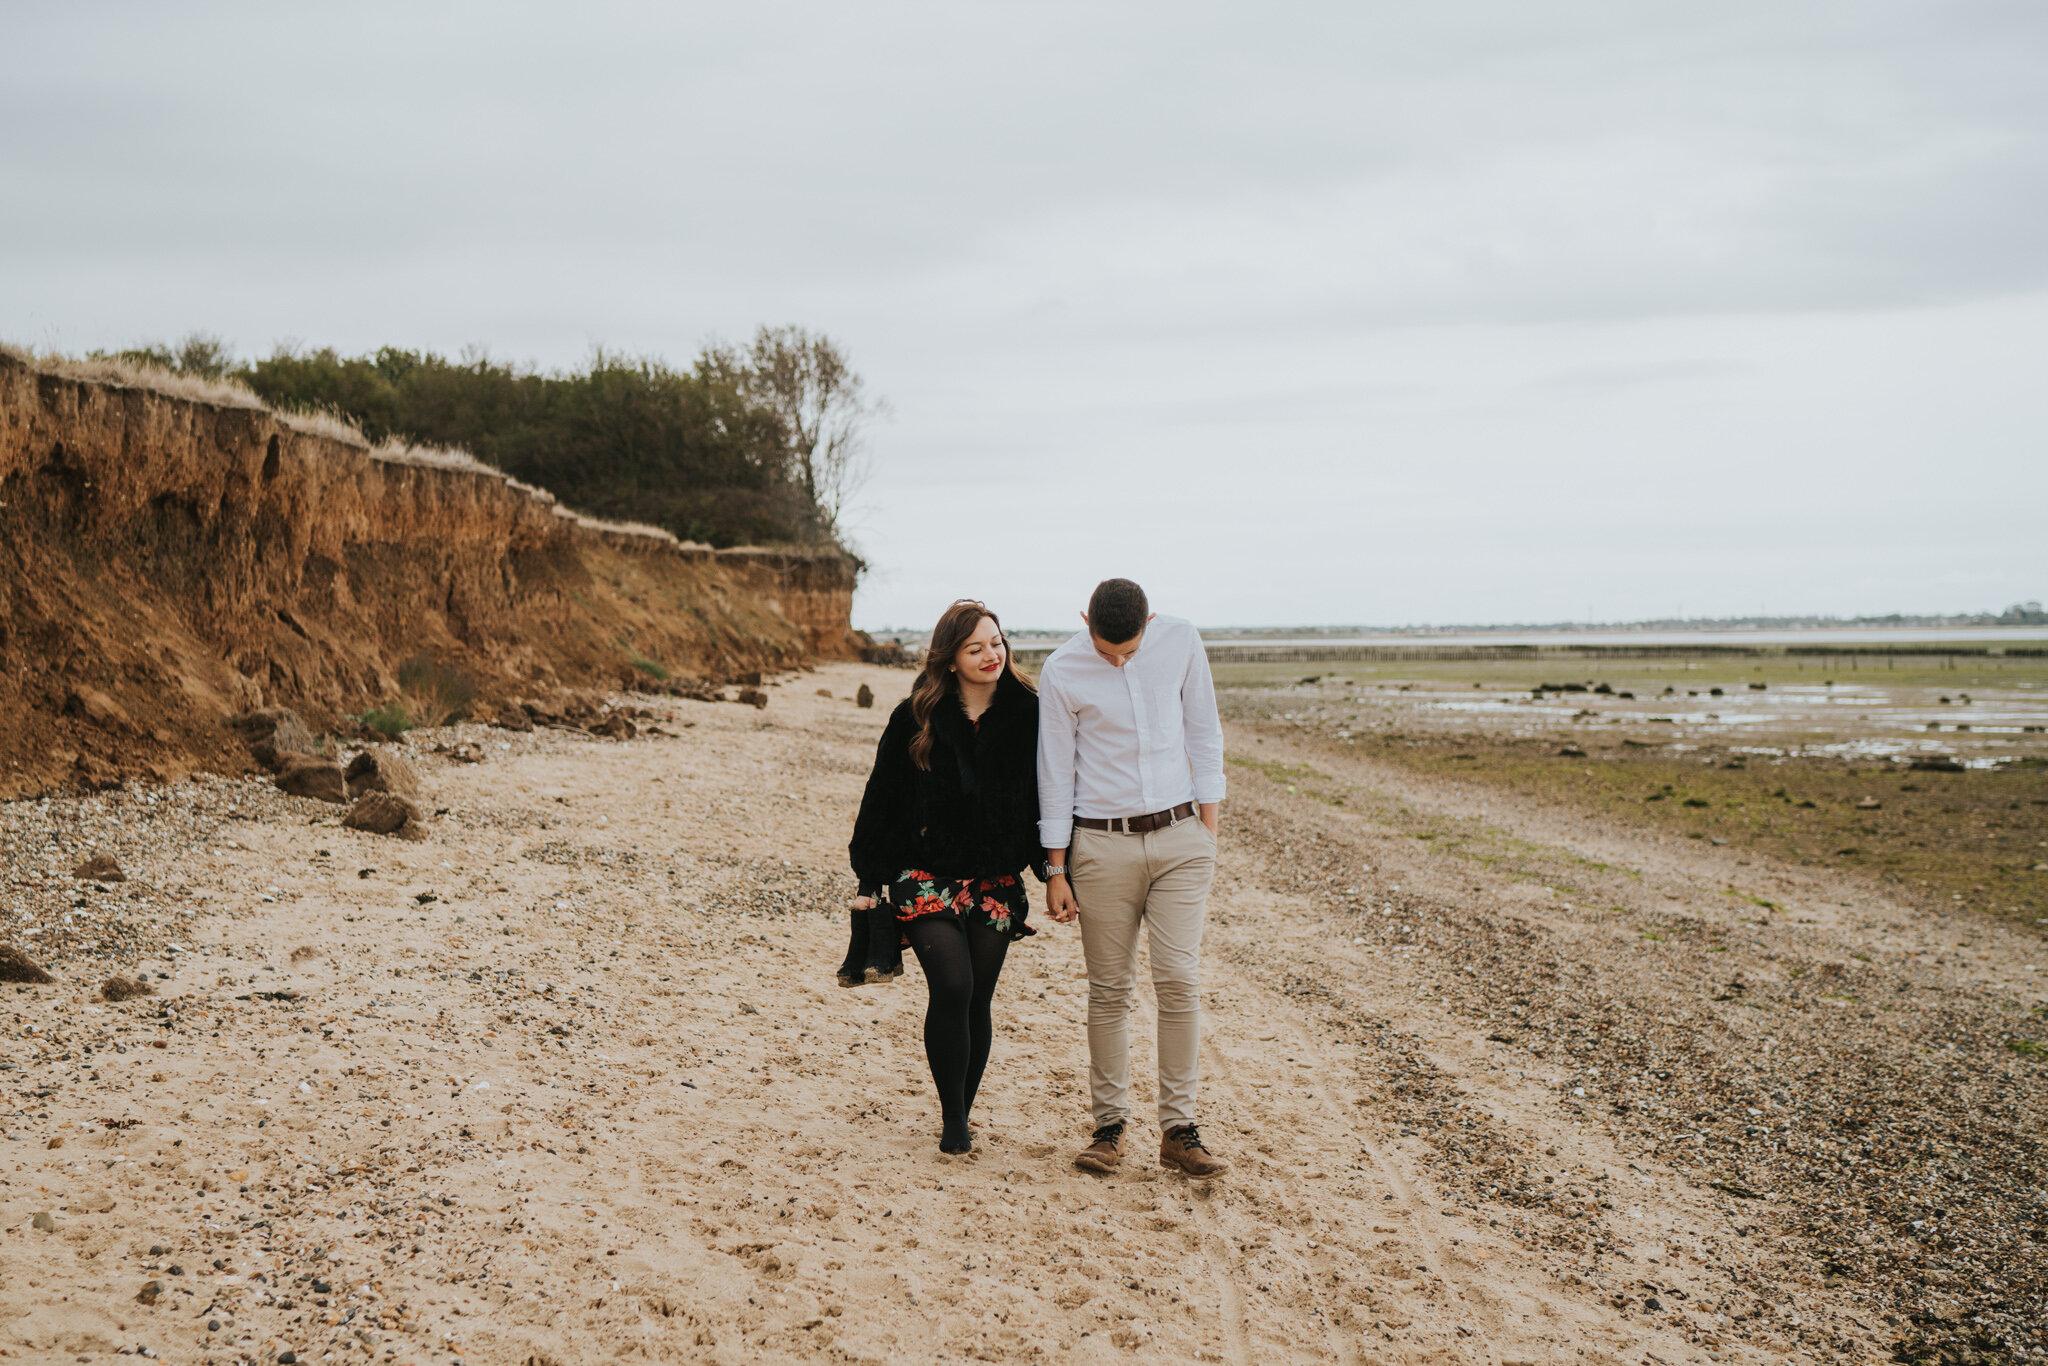 engagement-pre-wedding-hannah-michael-cudmore-grove-east-mersea-grace-elizabeth-colchester-essex-devon-suffolk-and-norfolk-alternative-wedding-and-family-photographer (32 of 51).jpg